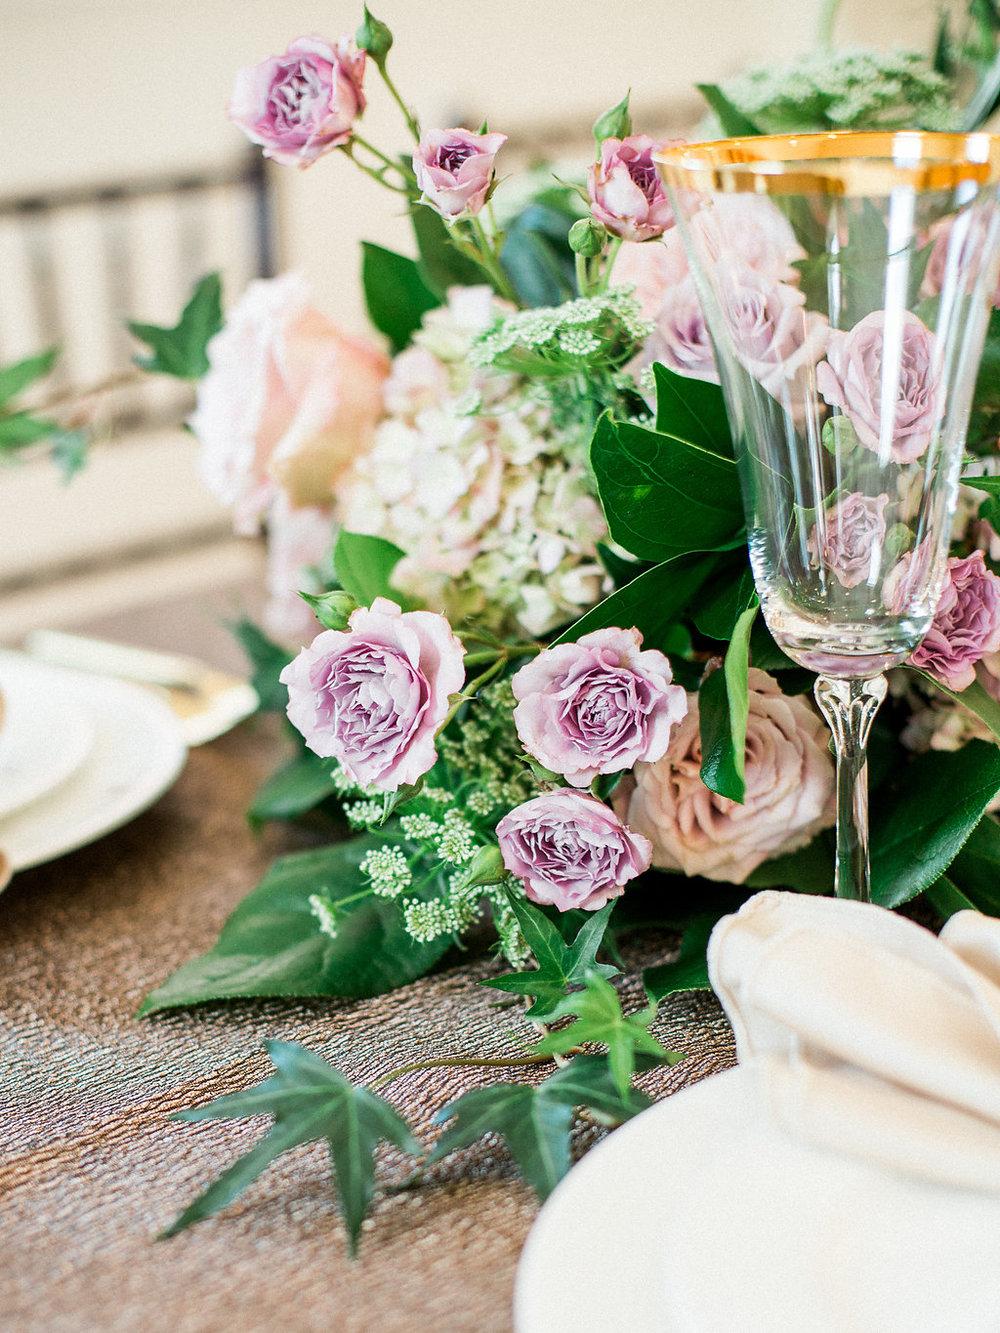 Elegant Winter Wedding - Pastel Wedding Flowers